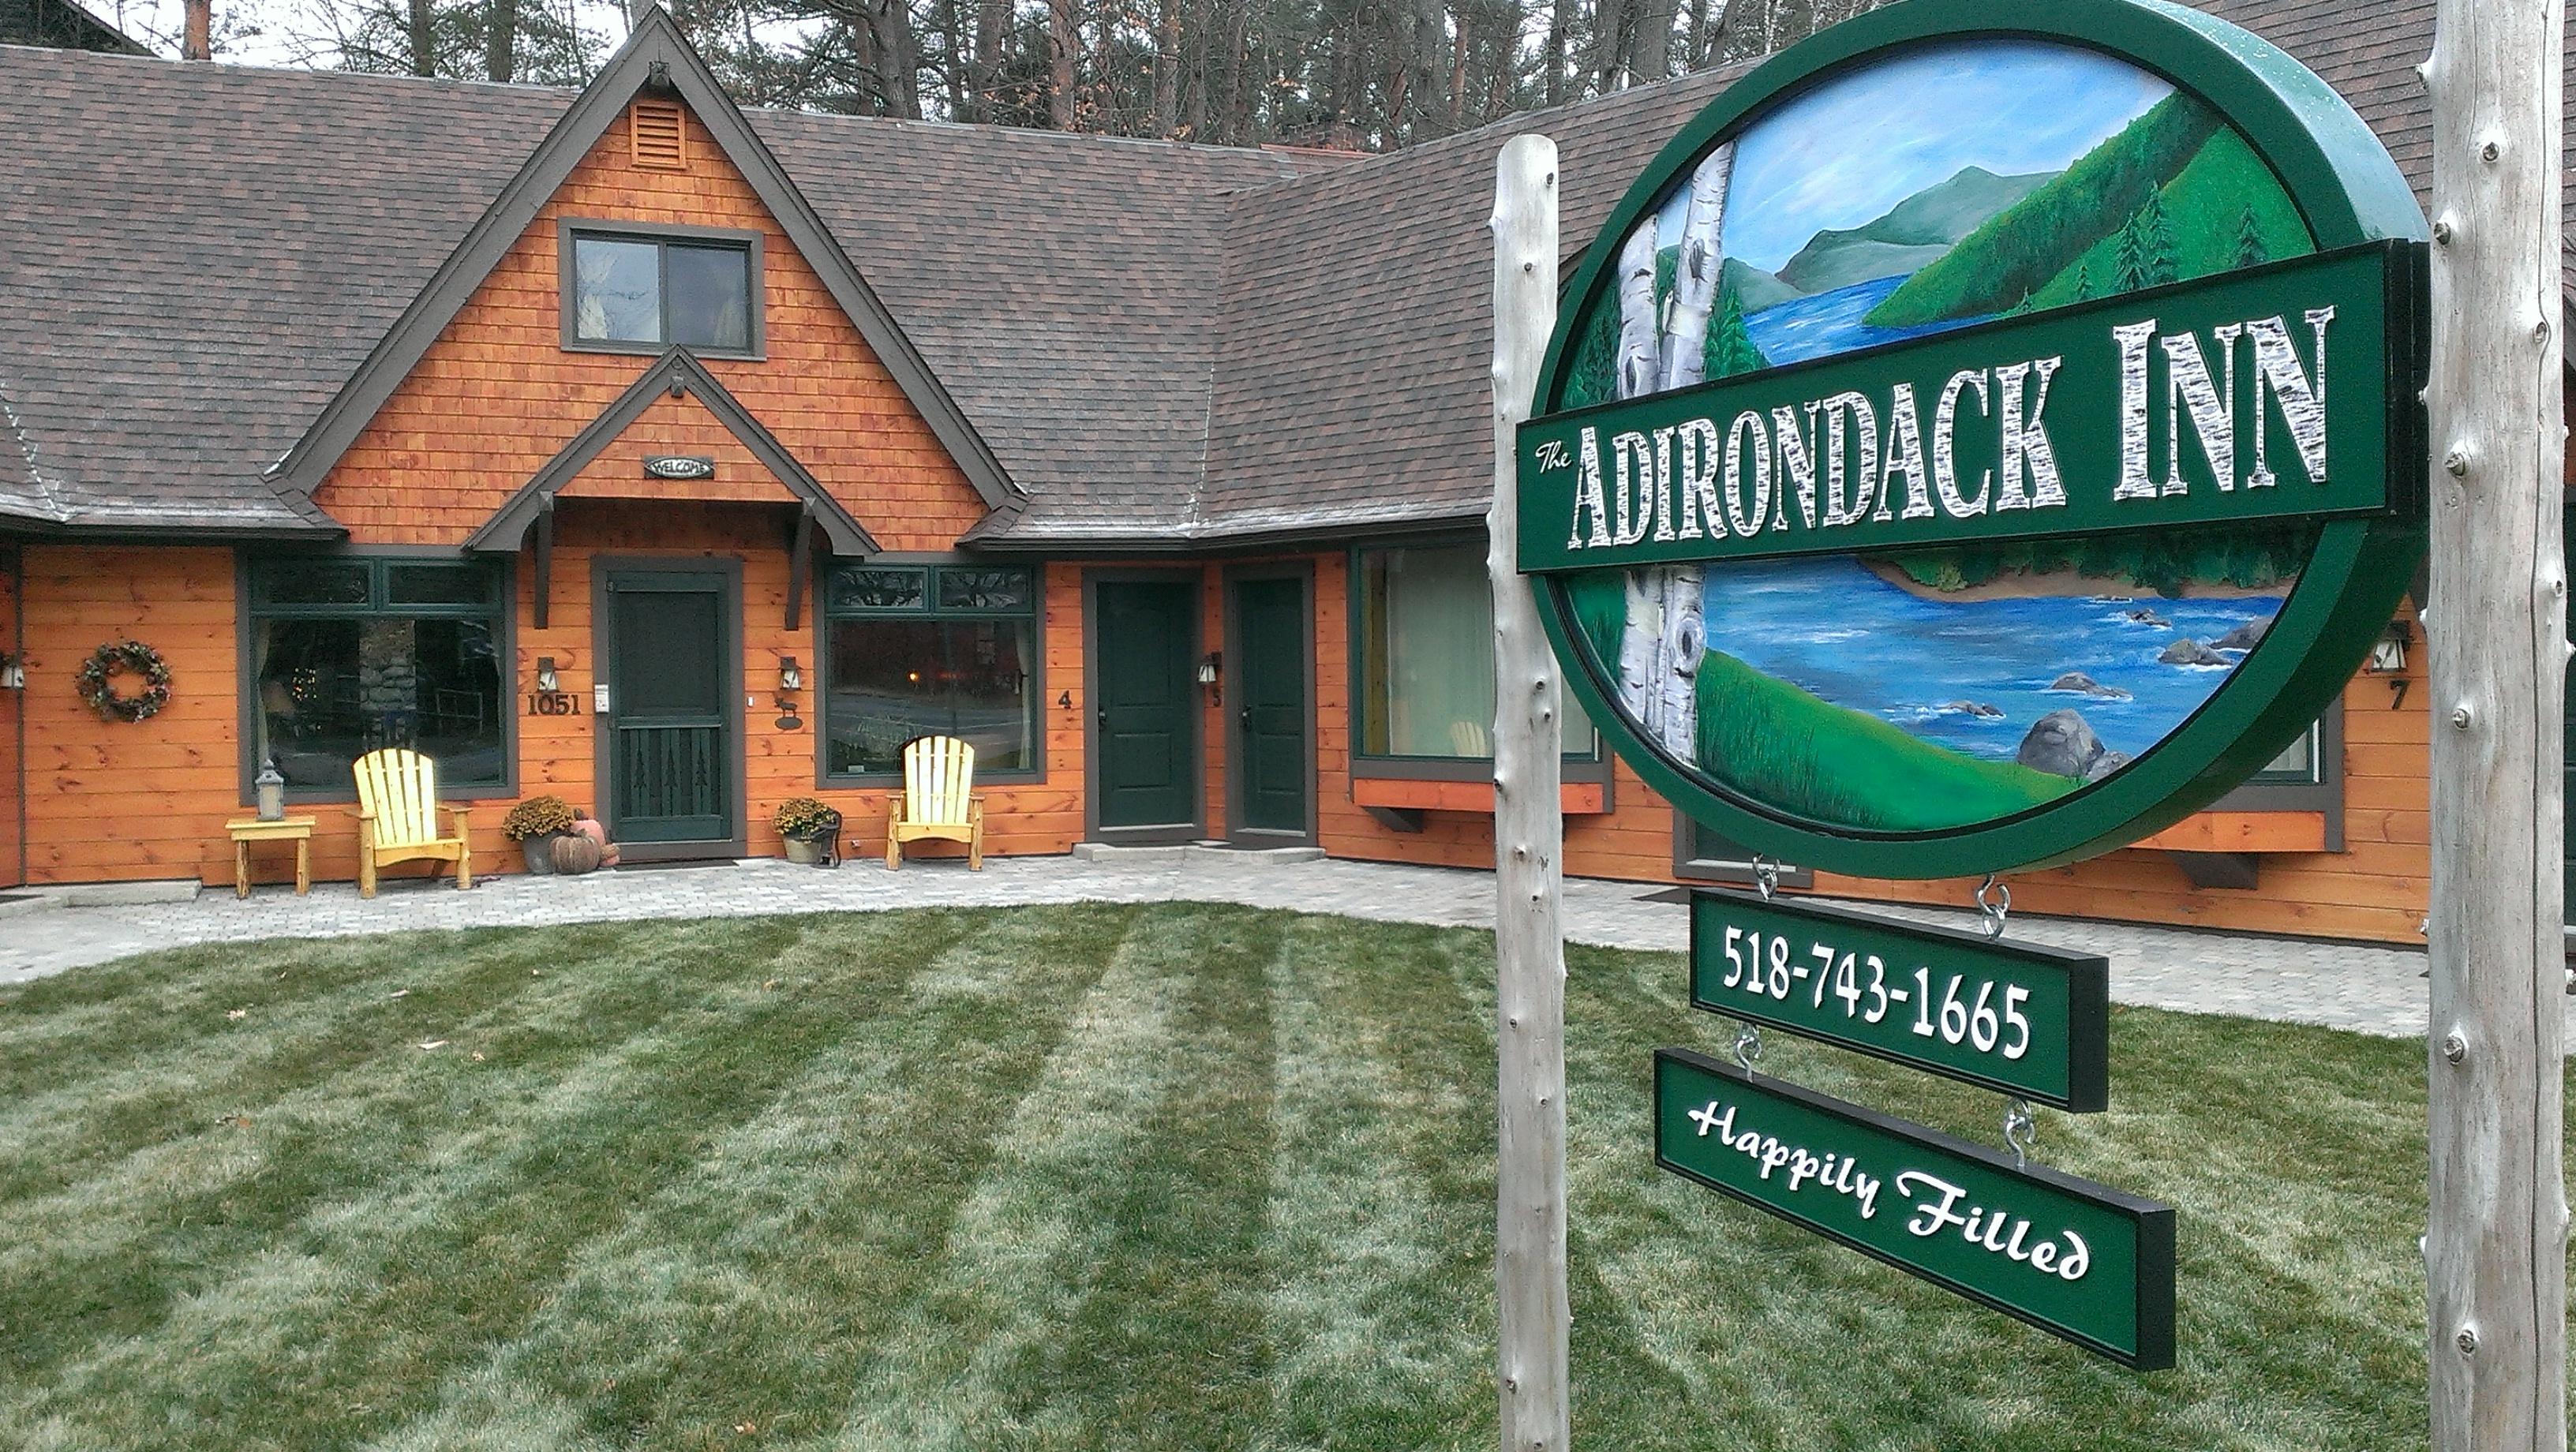 The Adirondack Inn, Schroon Lake NY